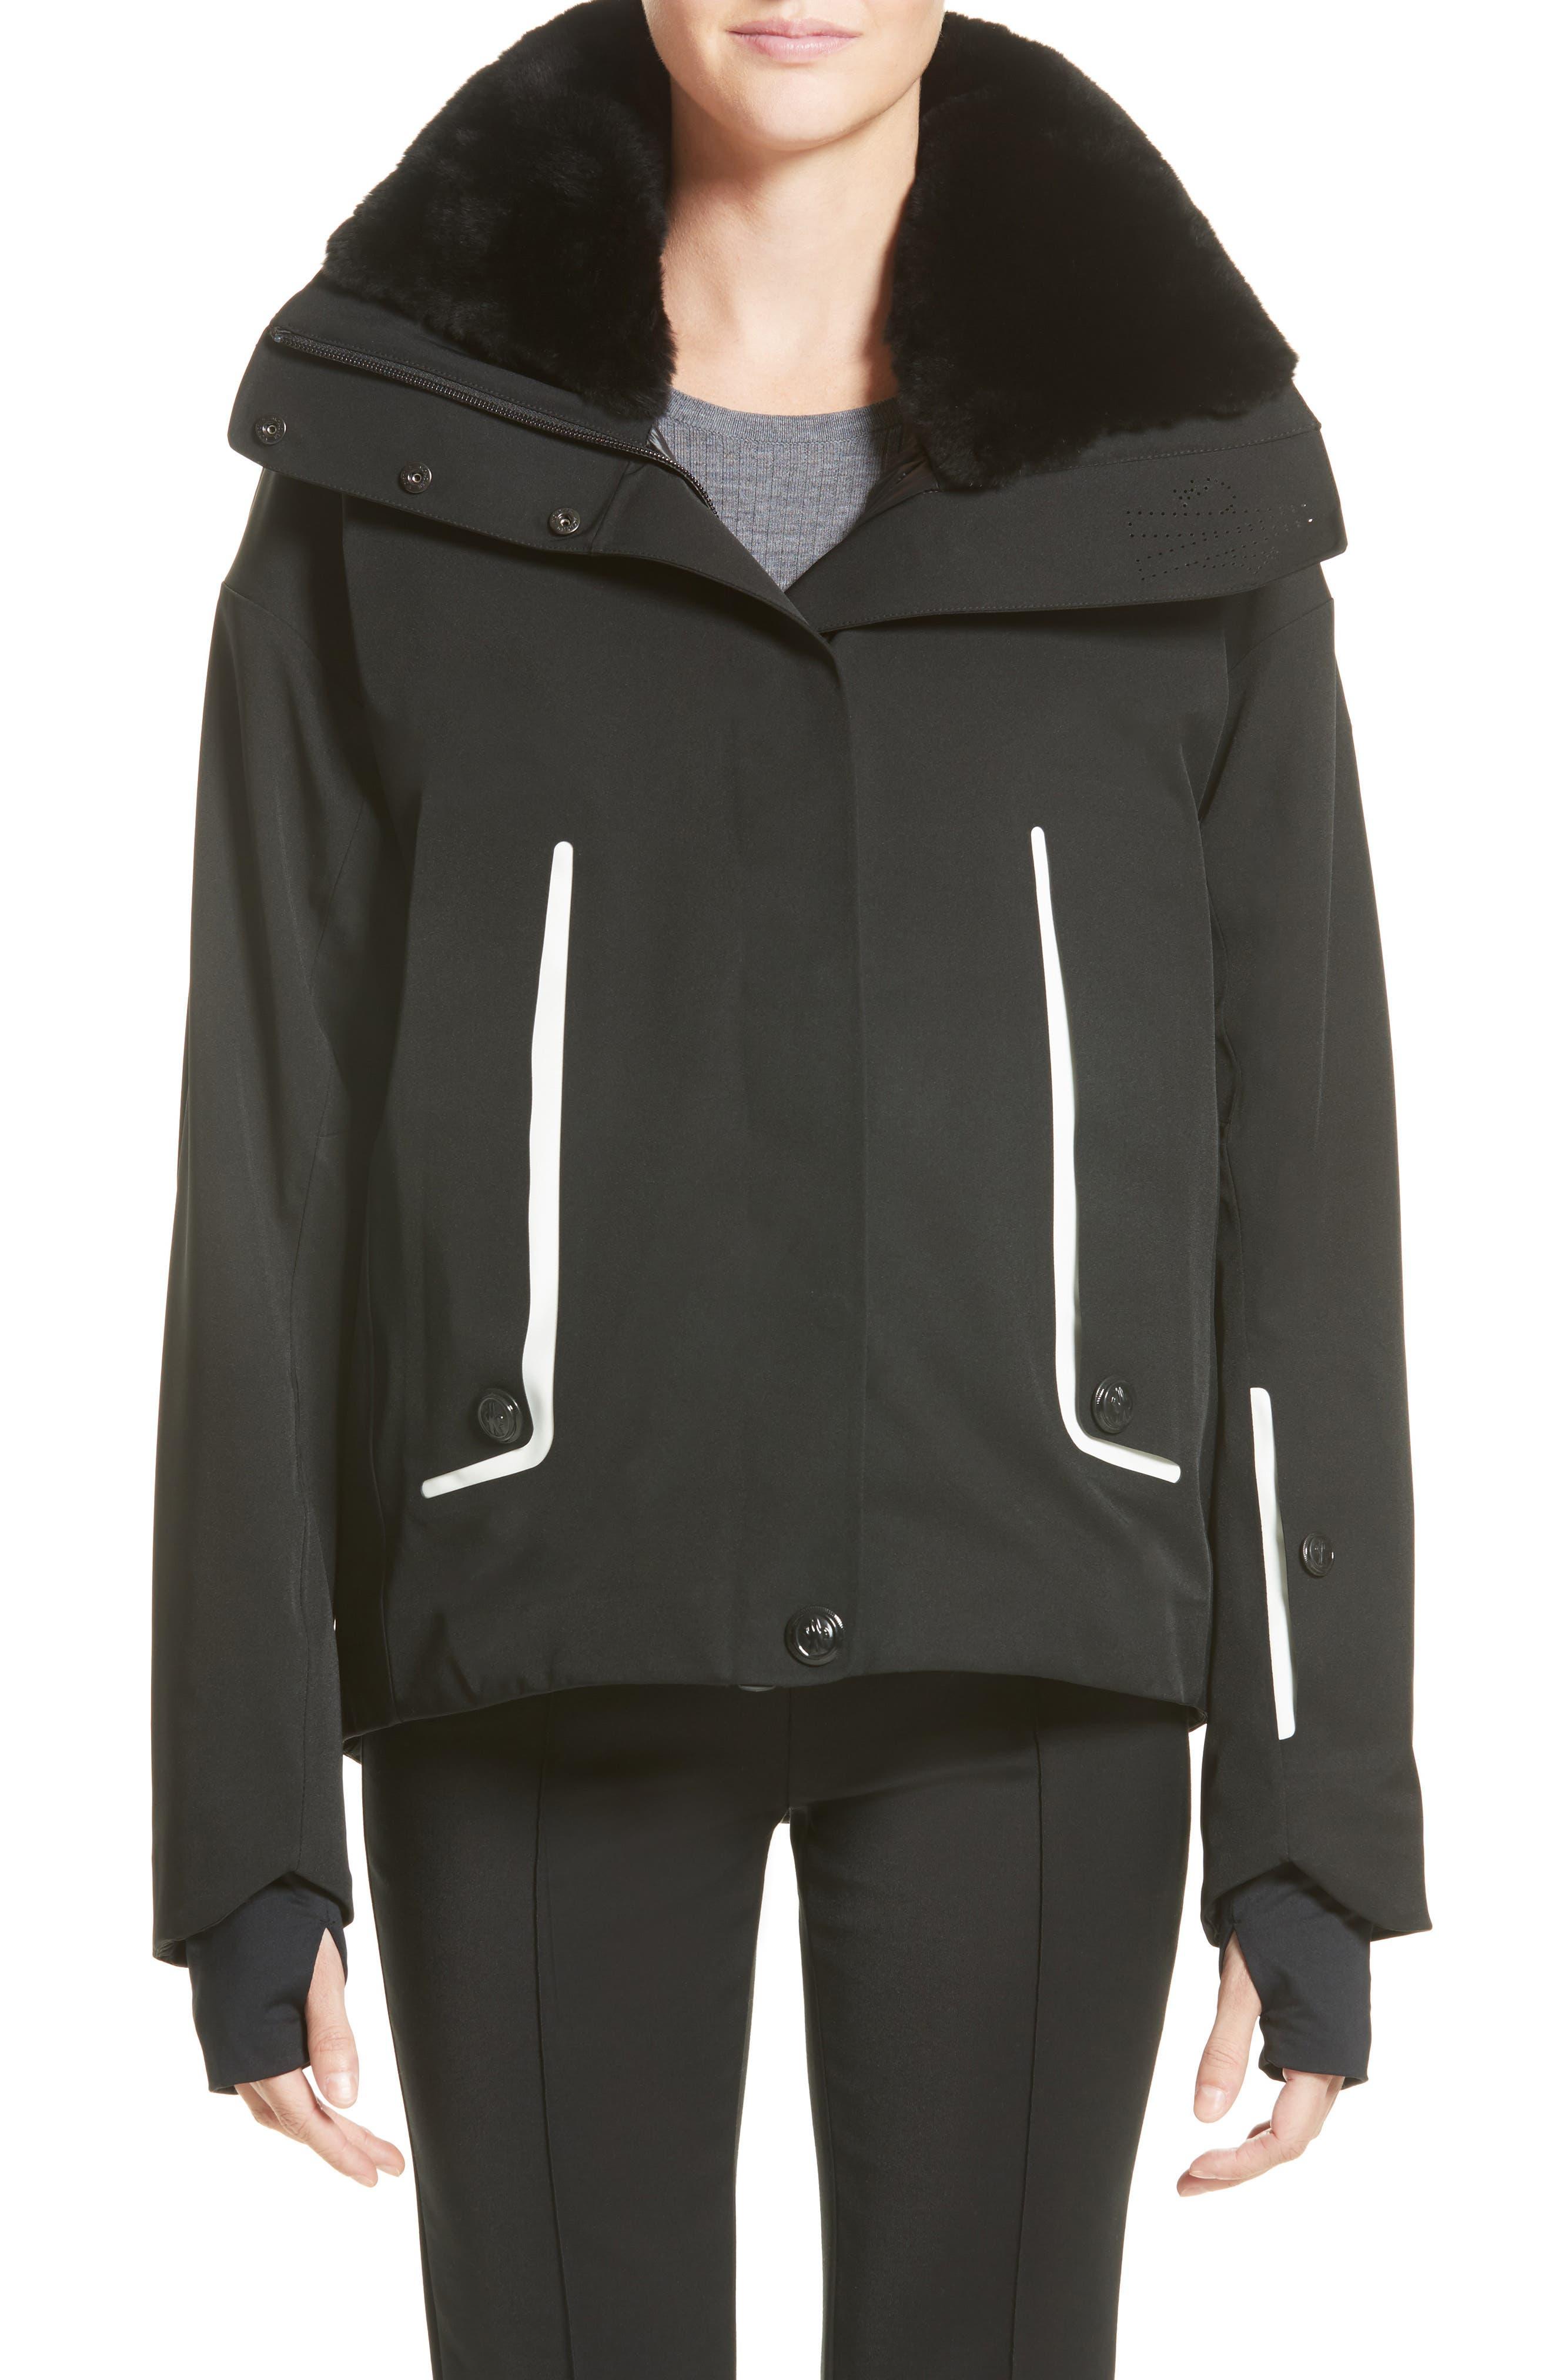 Troisvallees Jacket with Genuine Nutria Fur Collar,                             Main thumbnail 1, color,                             Black/ White